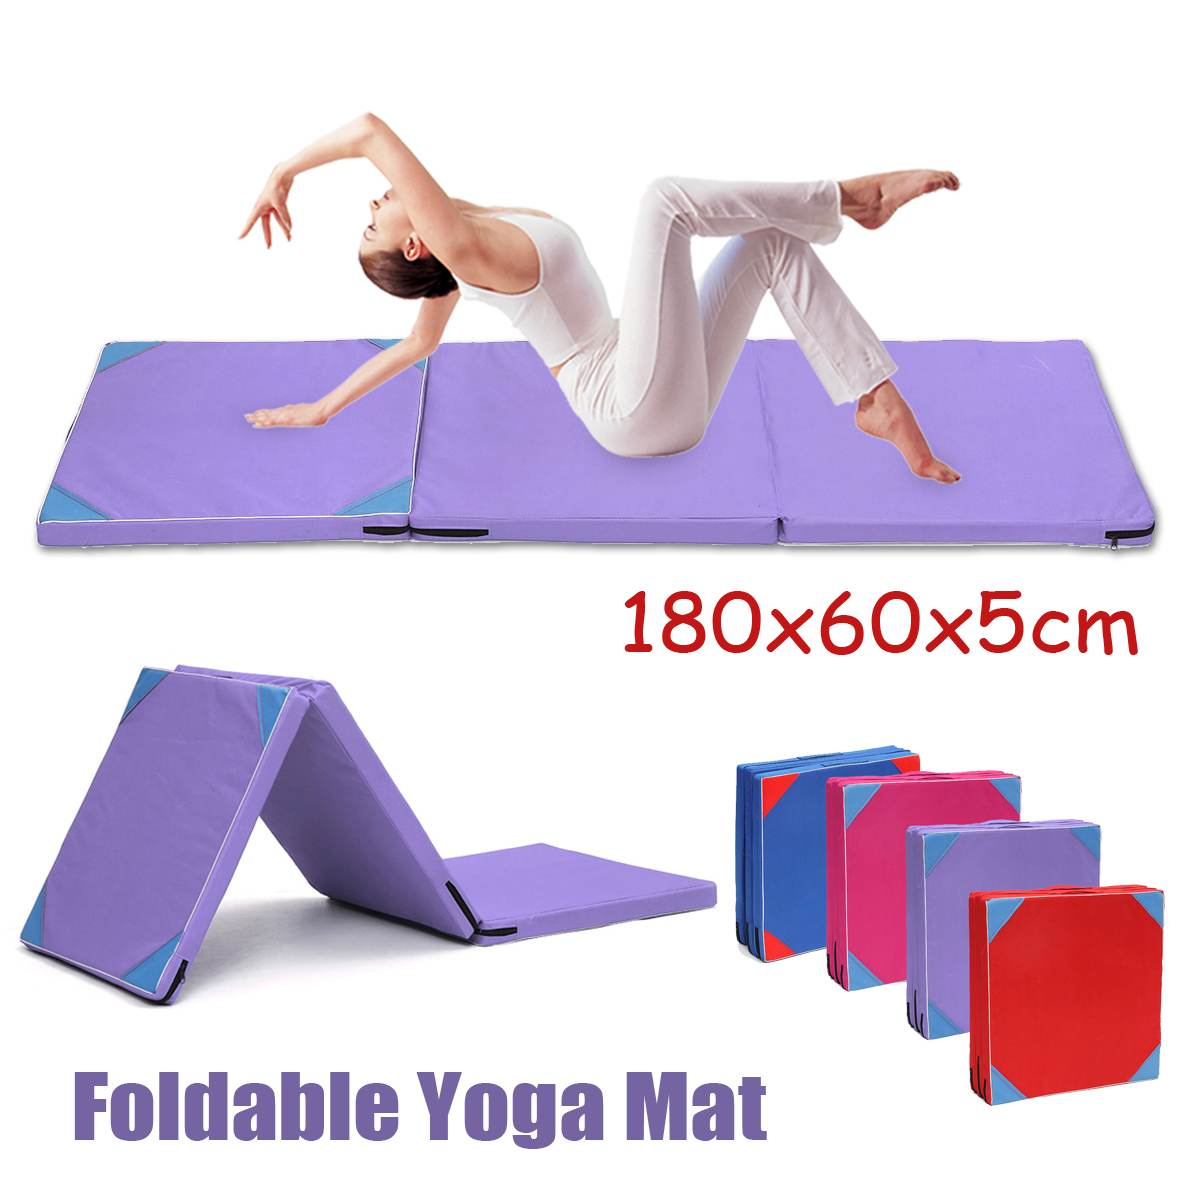 Folding Gymnastics Mat Gym Yoga Mat Non Slip Dance Exercise Fitness Judo Pilates Gym Indoor Outdoor Picnic Mat 180x60x5cm